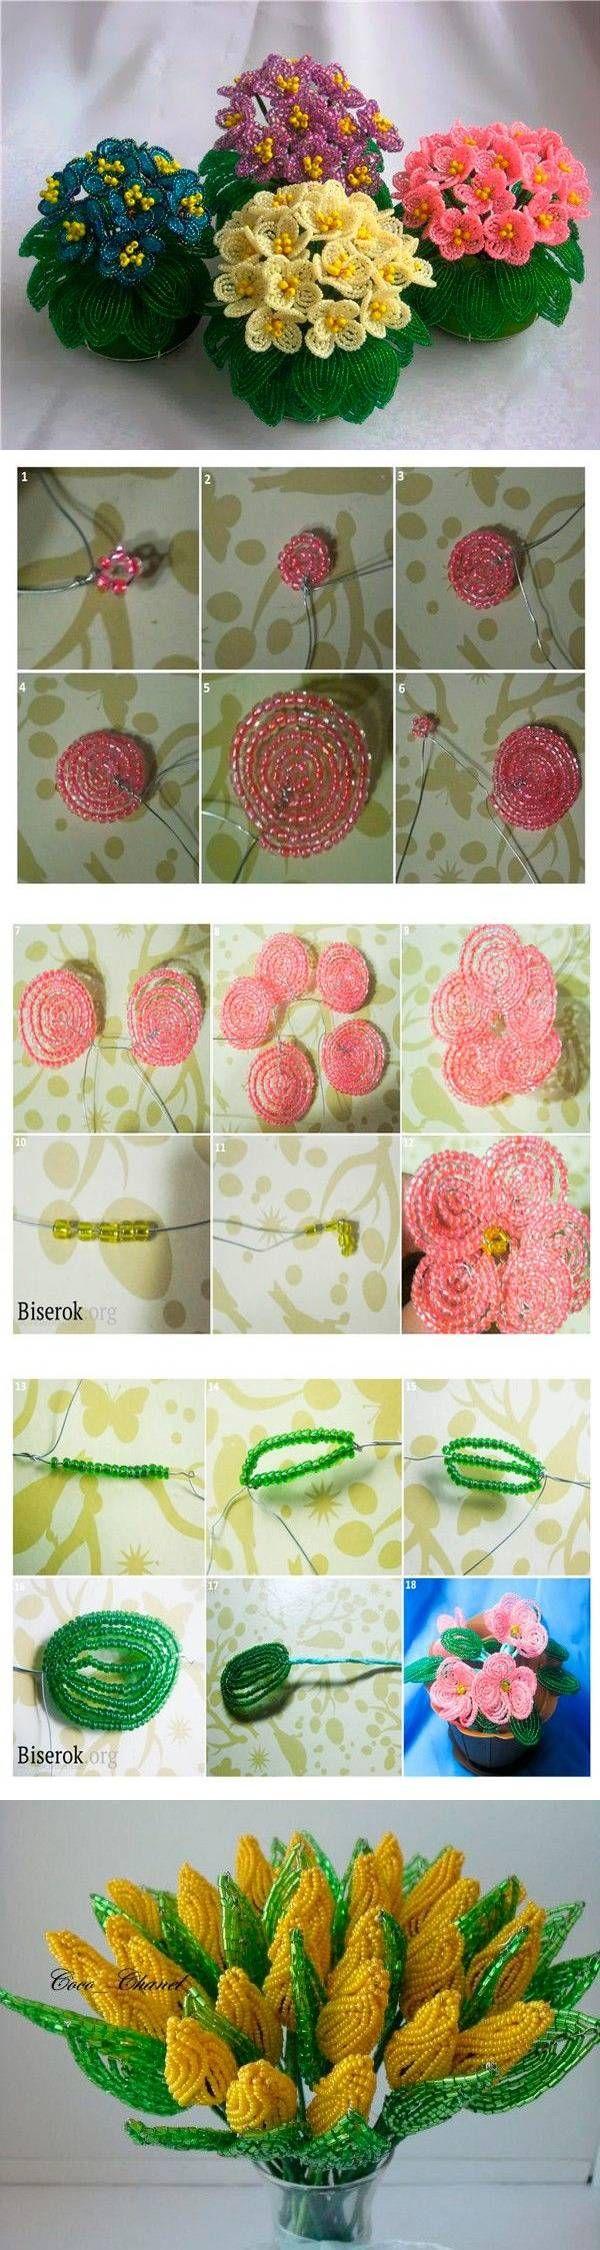 Цветы из бисера — 4 мастер-класса